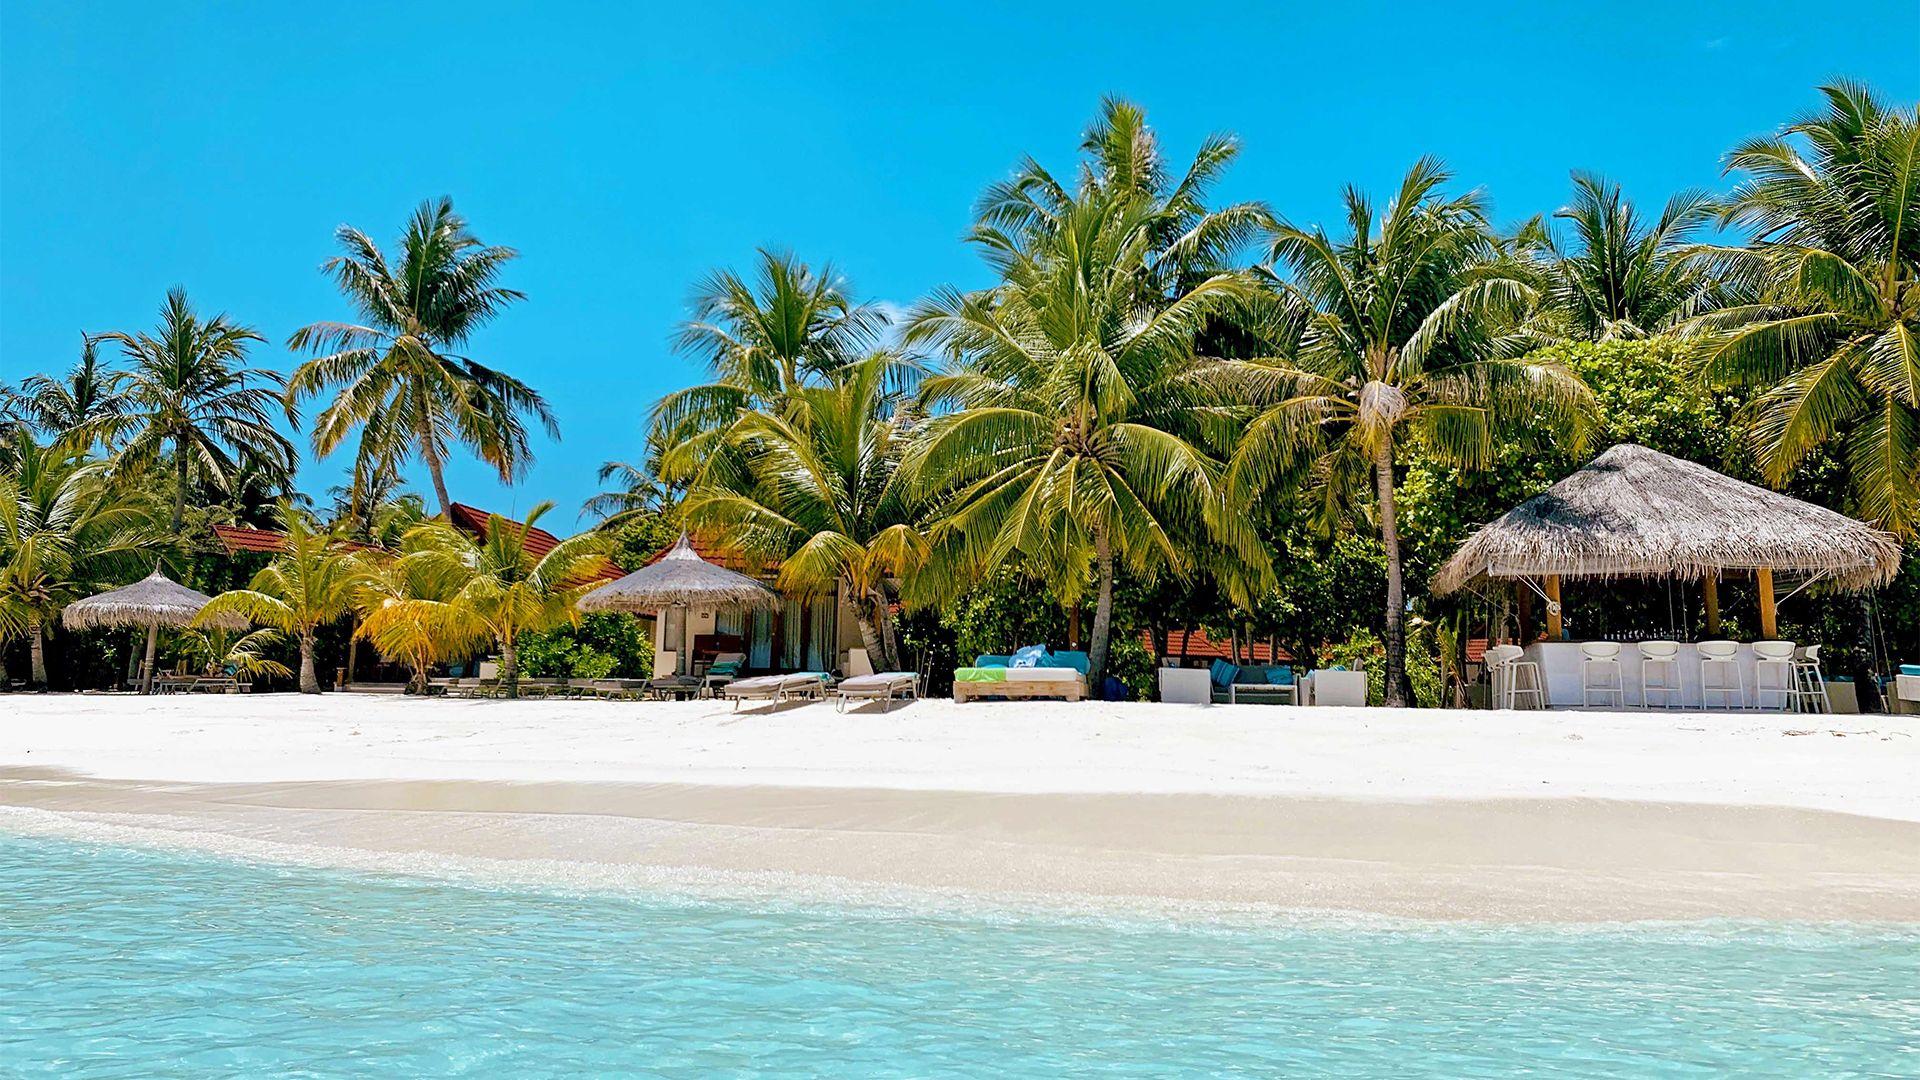 Sejur charter Maldive, 10 zile - 16 ianuarie 2022